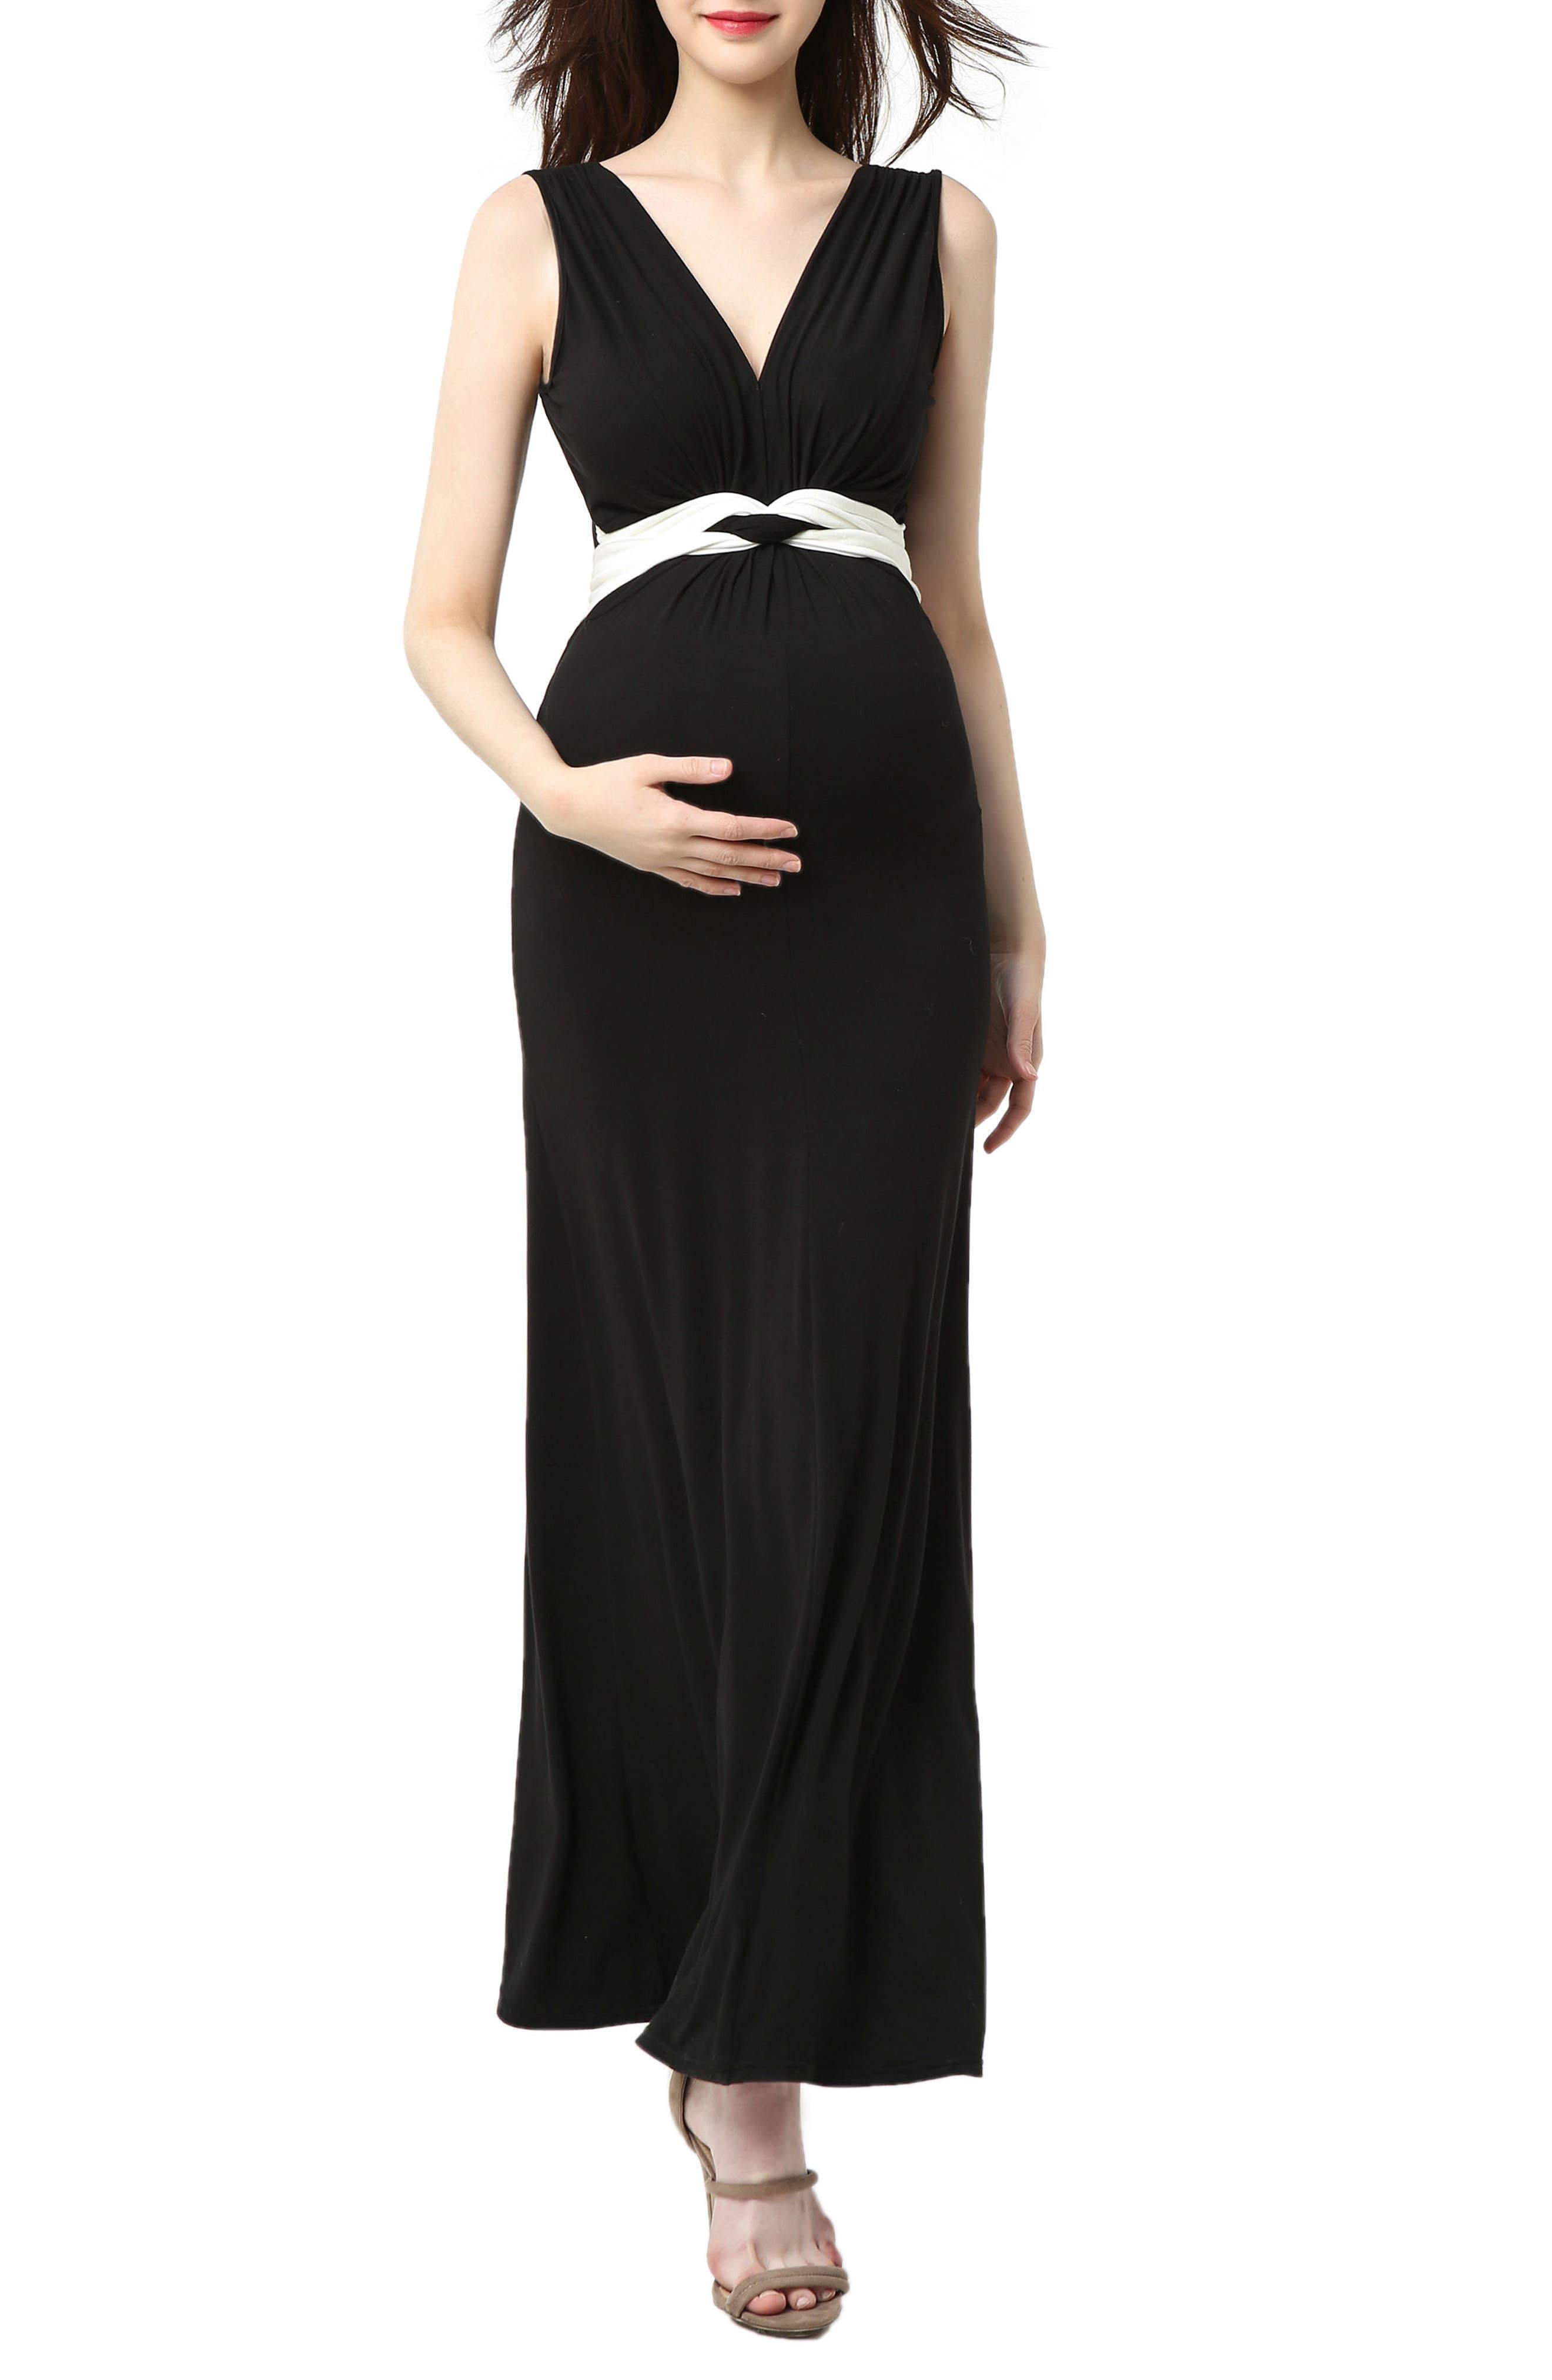 Kimi And Kai Scarlett Maternity Maxi Dress, Black